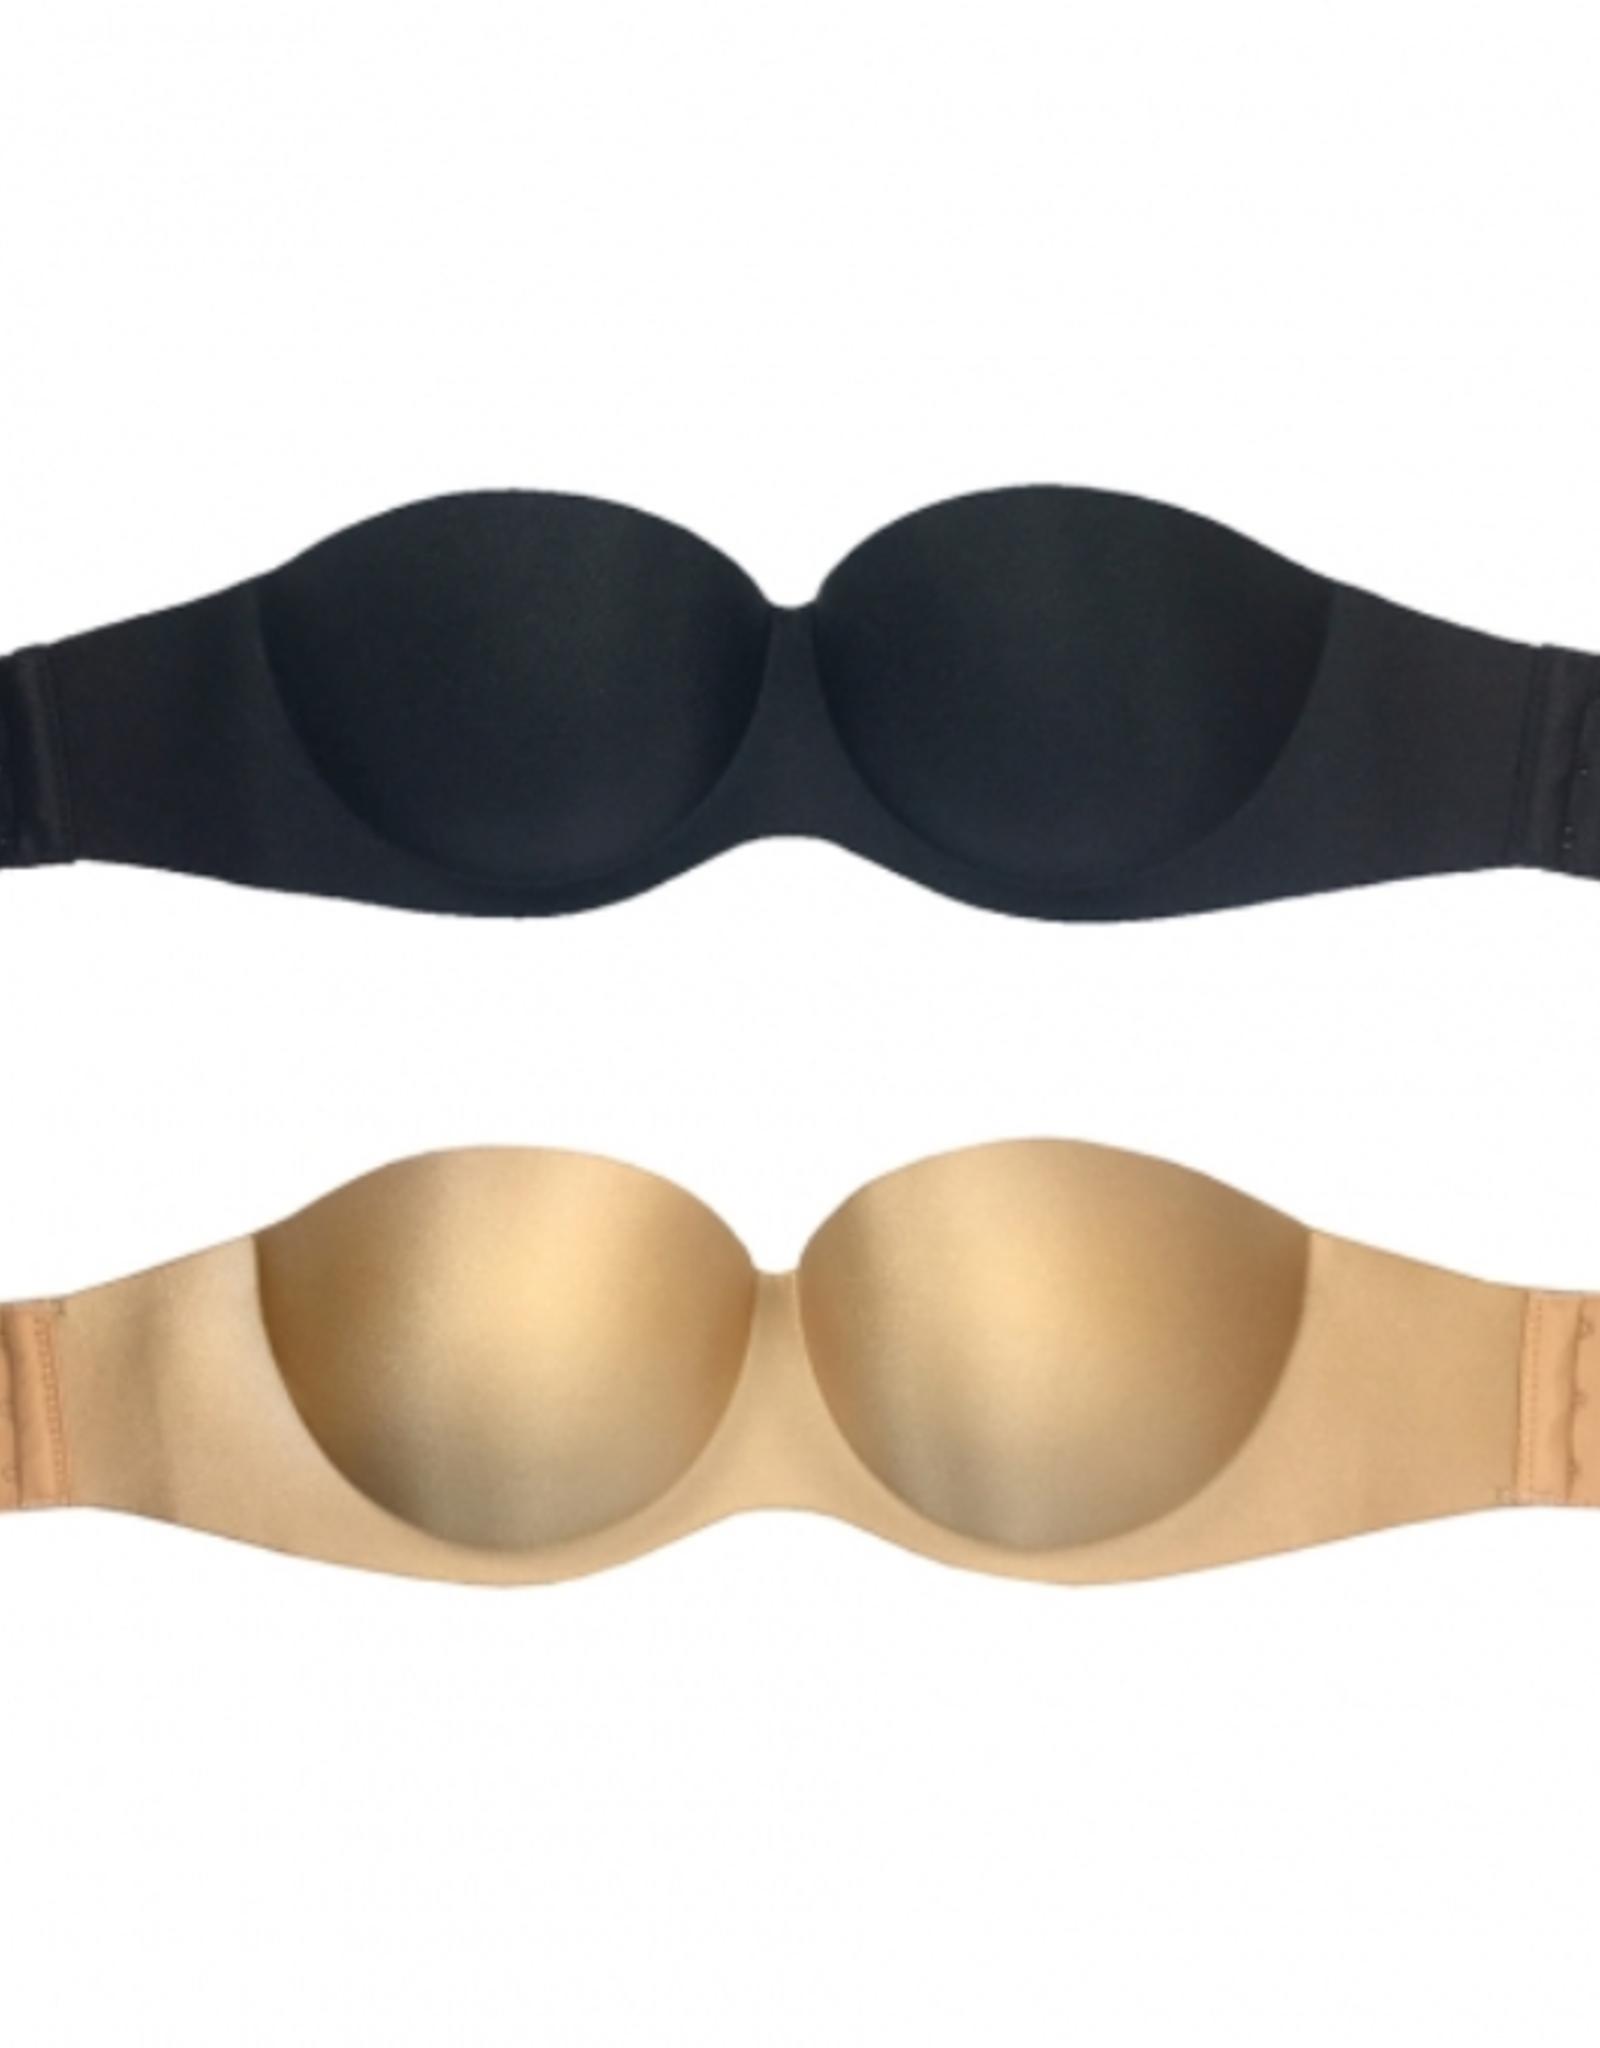 Strapless bra